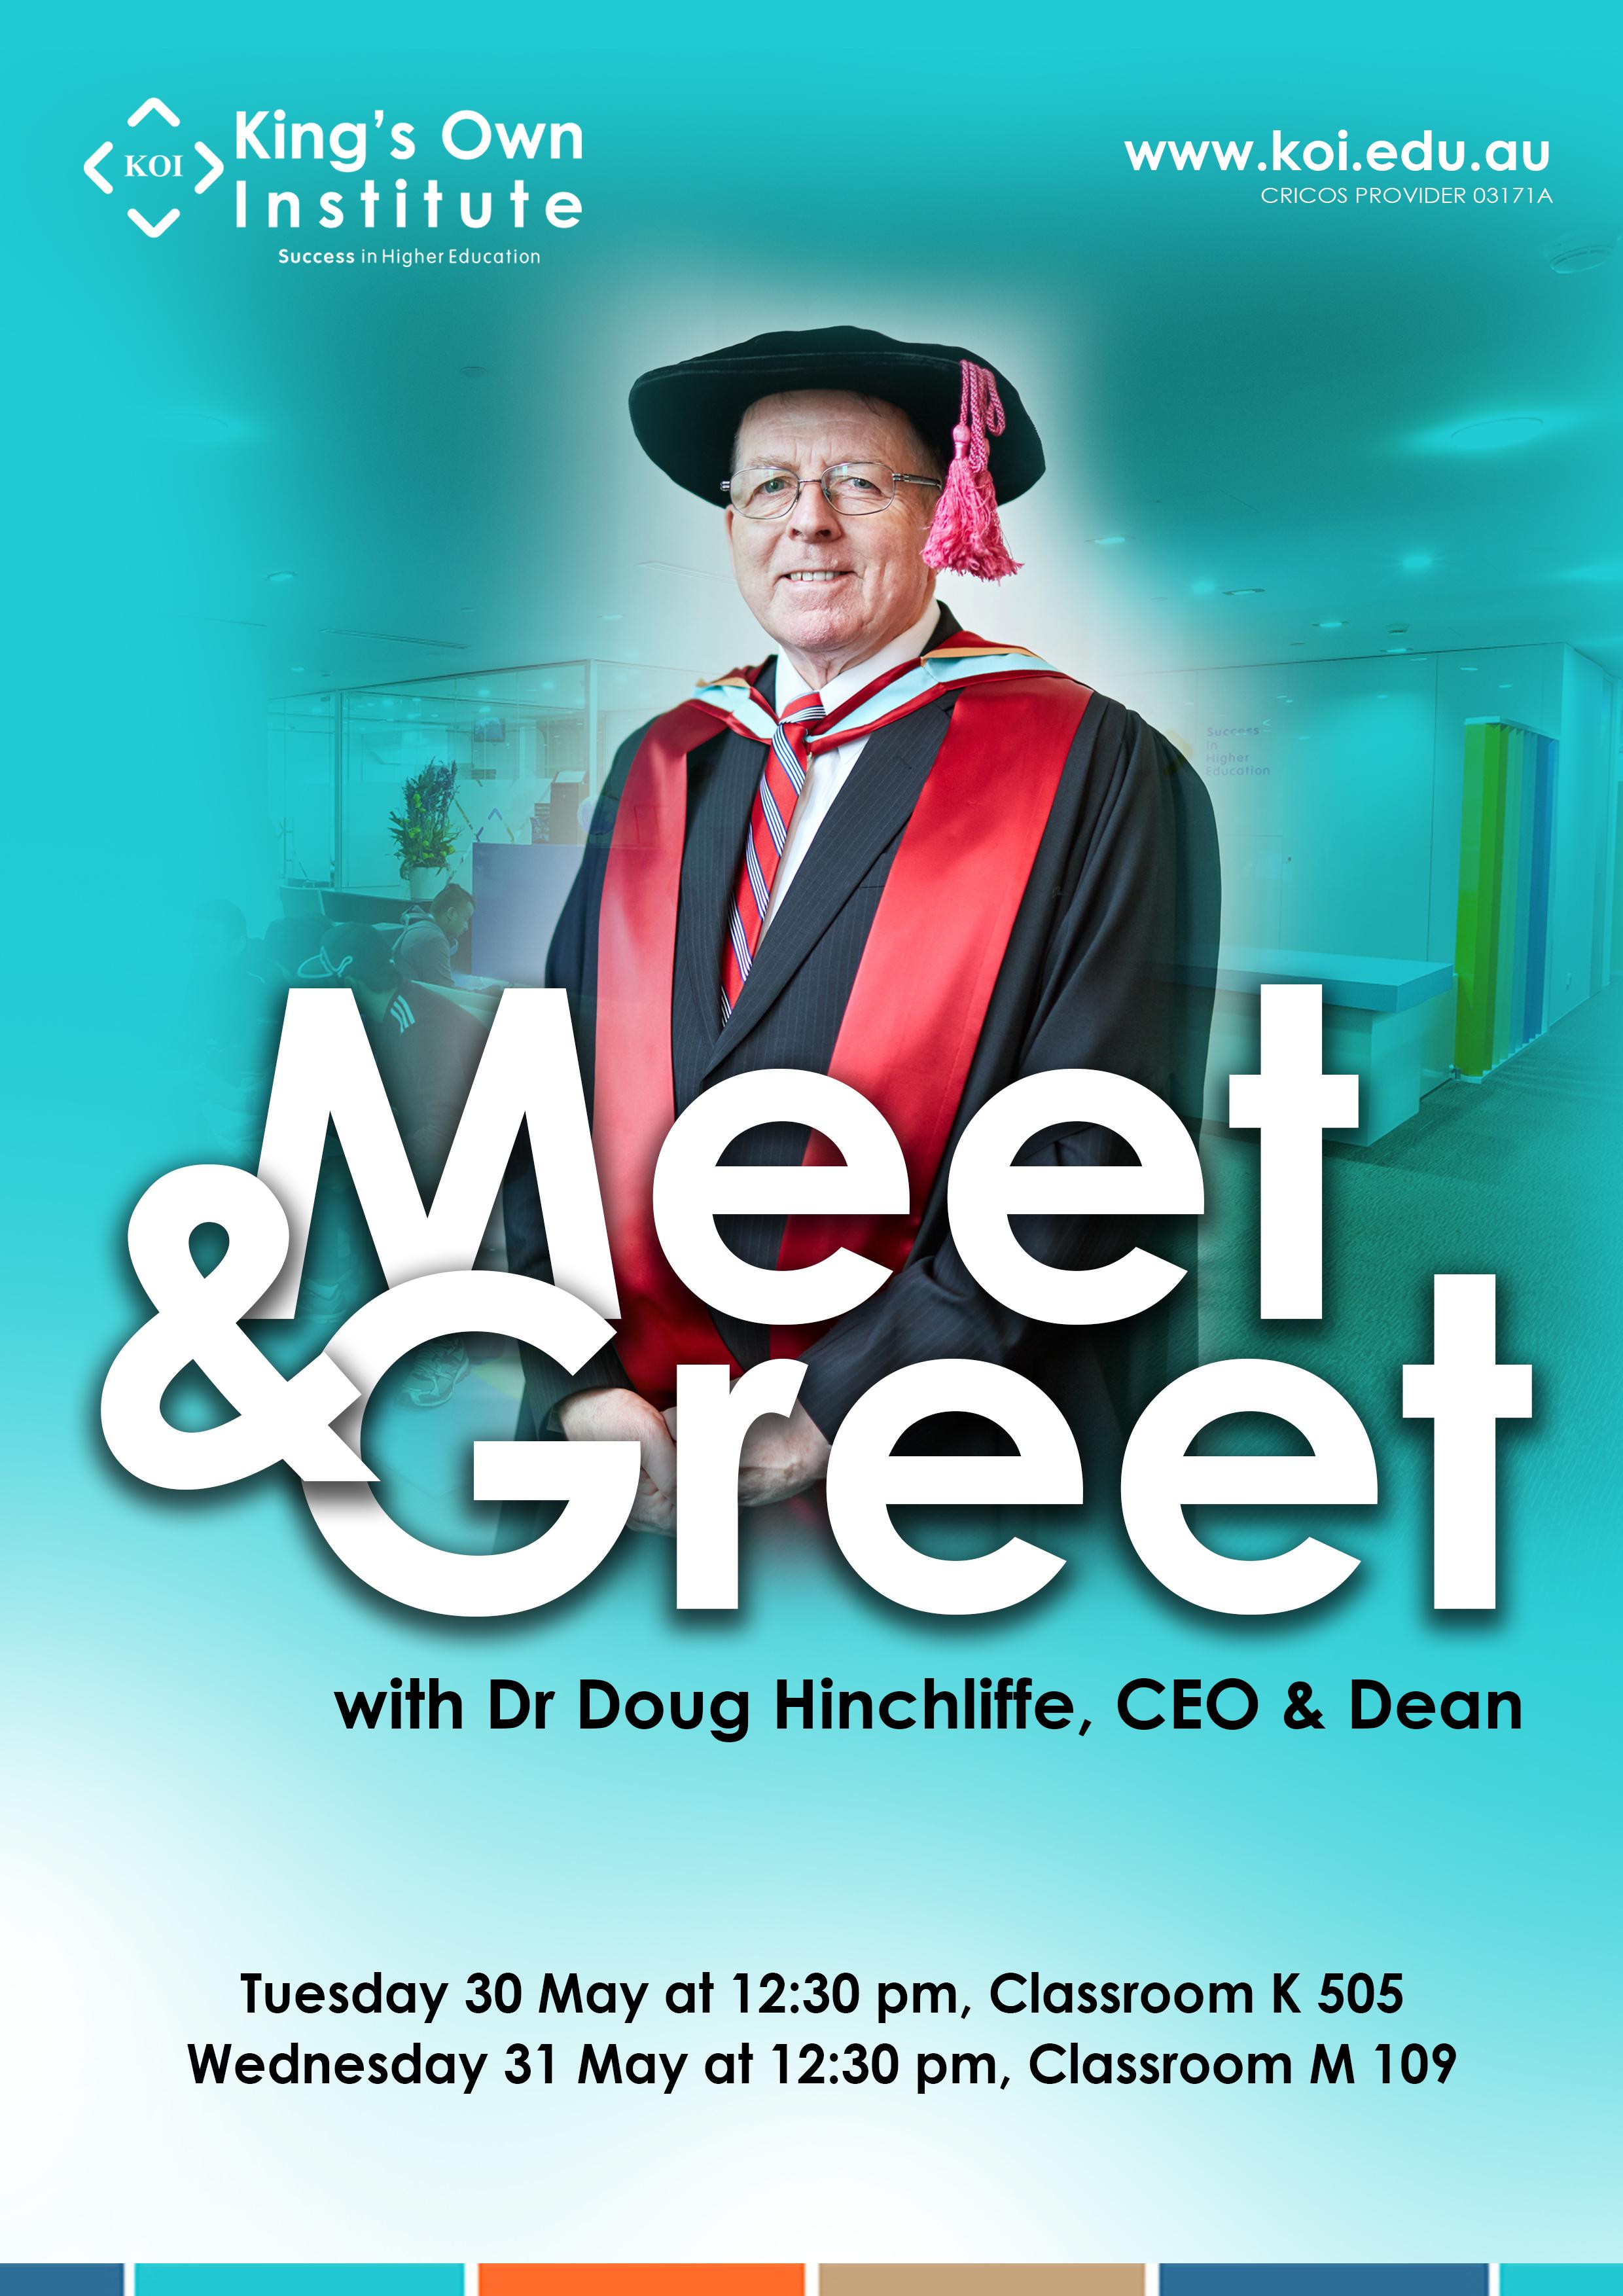 Koi Meet And Greet With Dr Doug Hinchliffe Ceo Dean